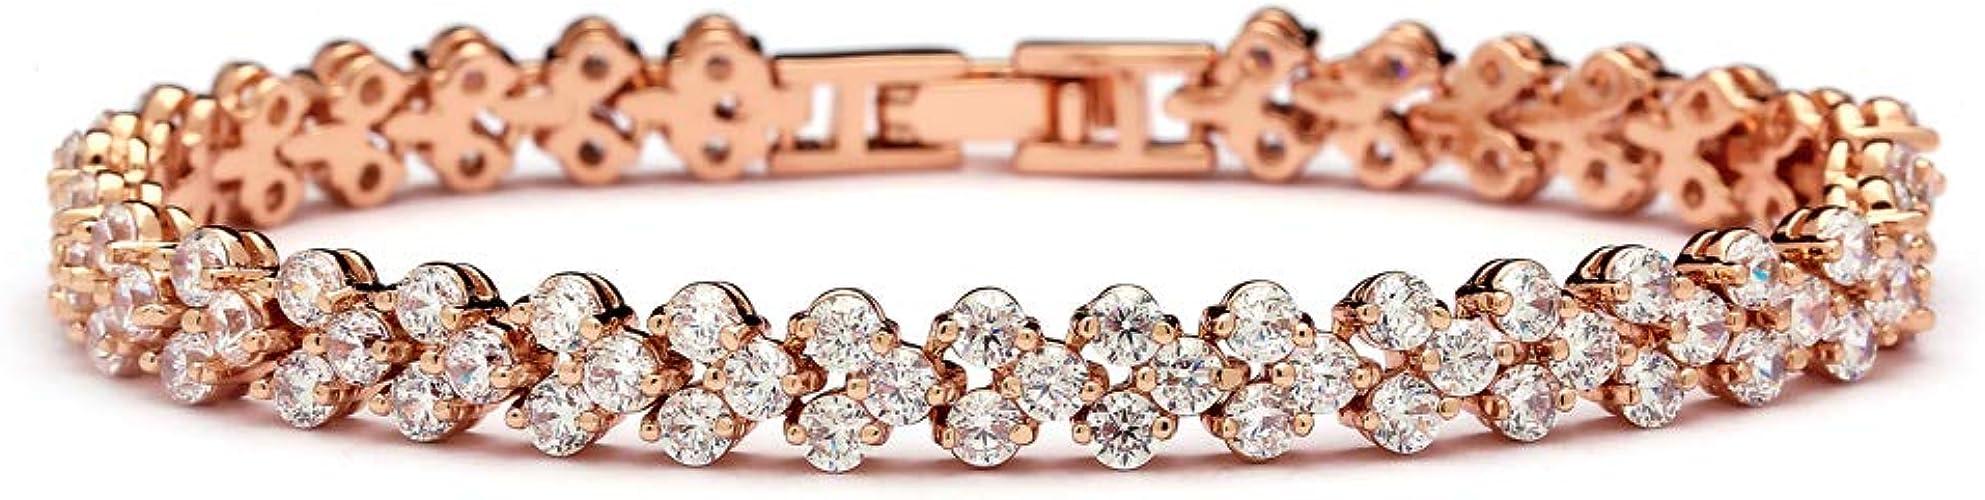 "Mariell 6 3//8/"" 14KT Gold Plated CZ Wedding Bridal or Prom Petite Tennis Bracelet"